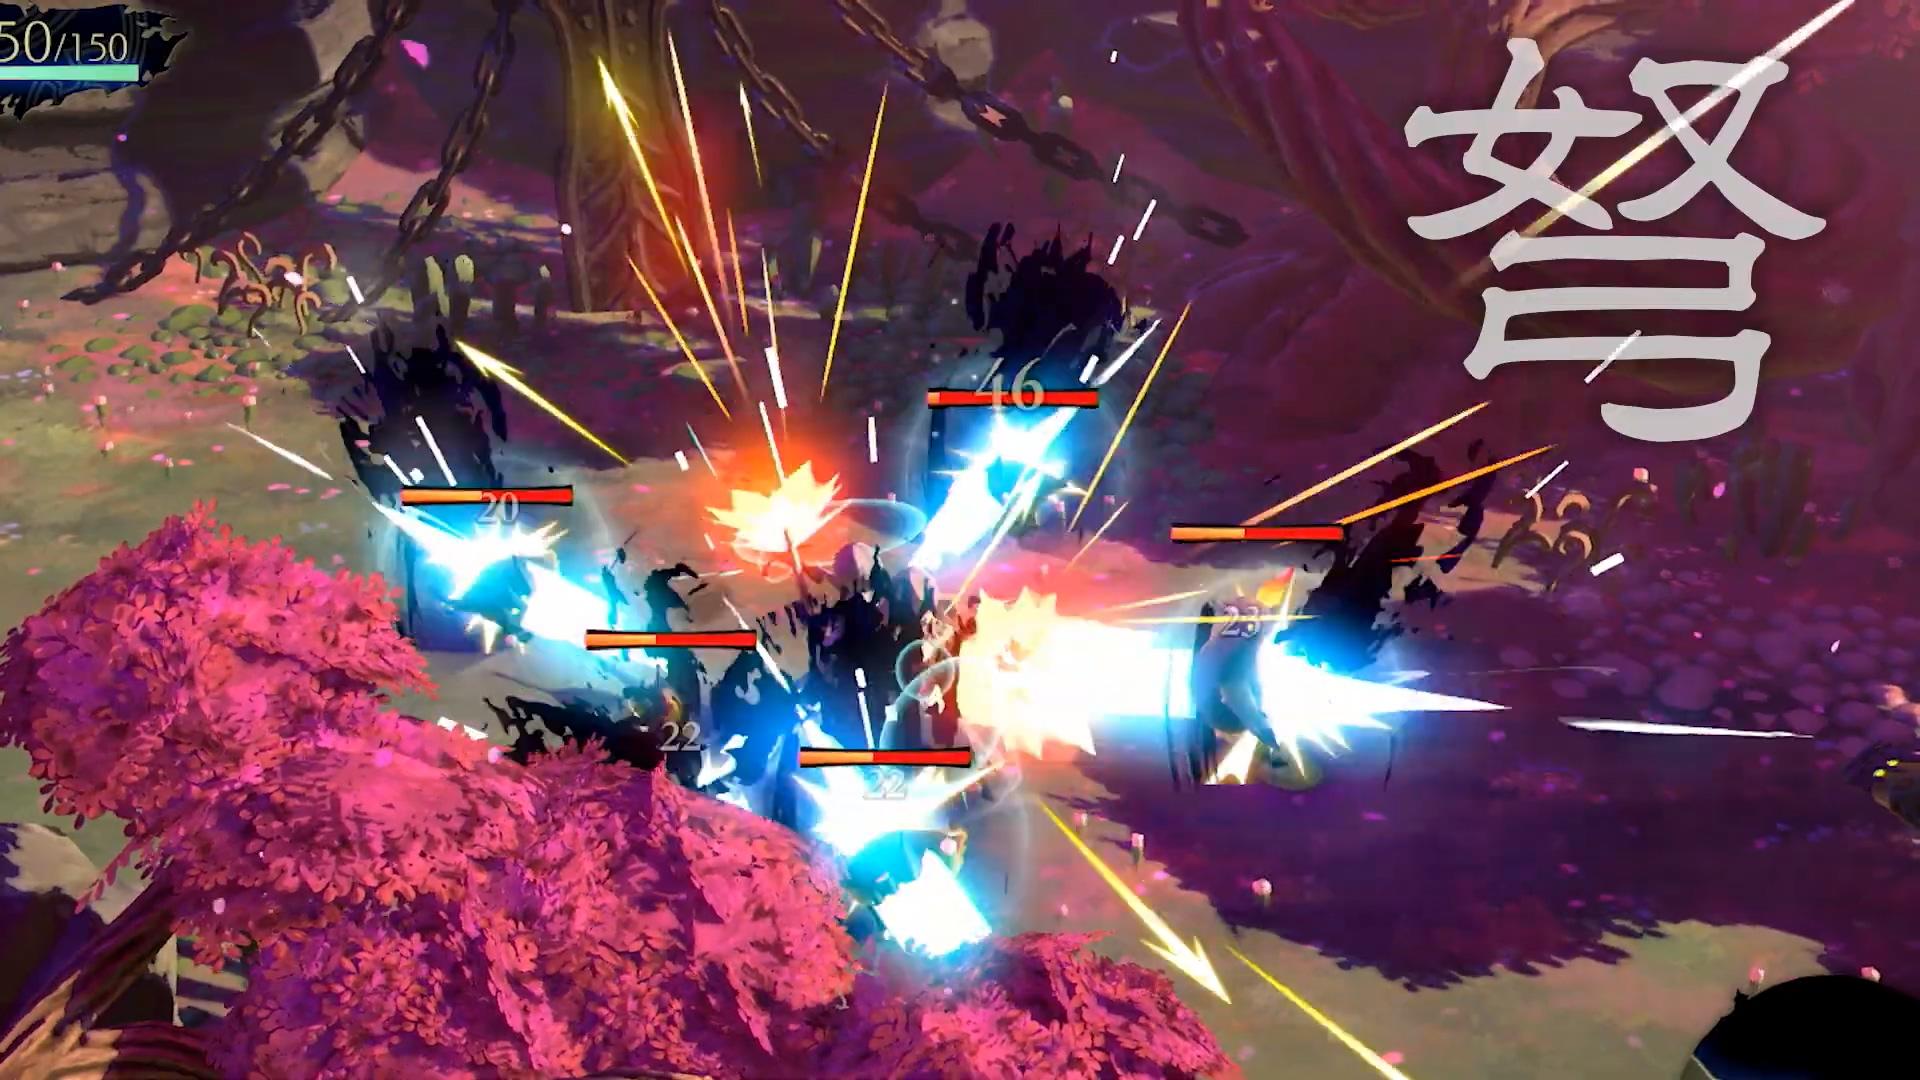 SQUARE ENIX动作RPG新作 《鬼哭邦》 夏季登陆STEAM